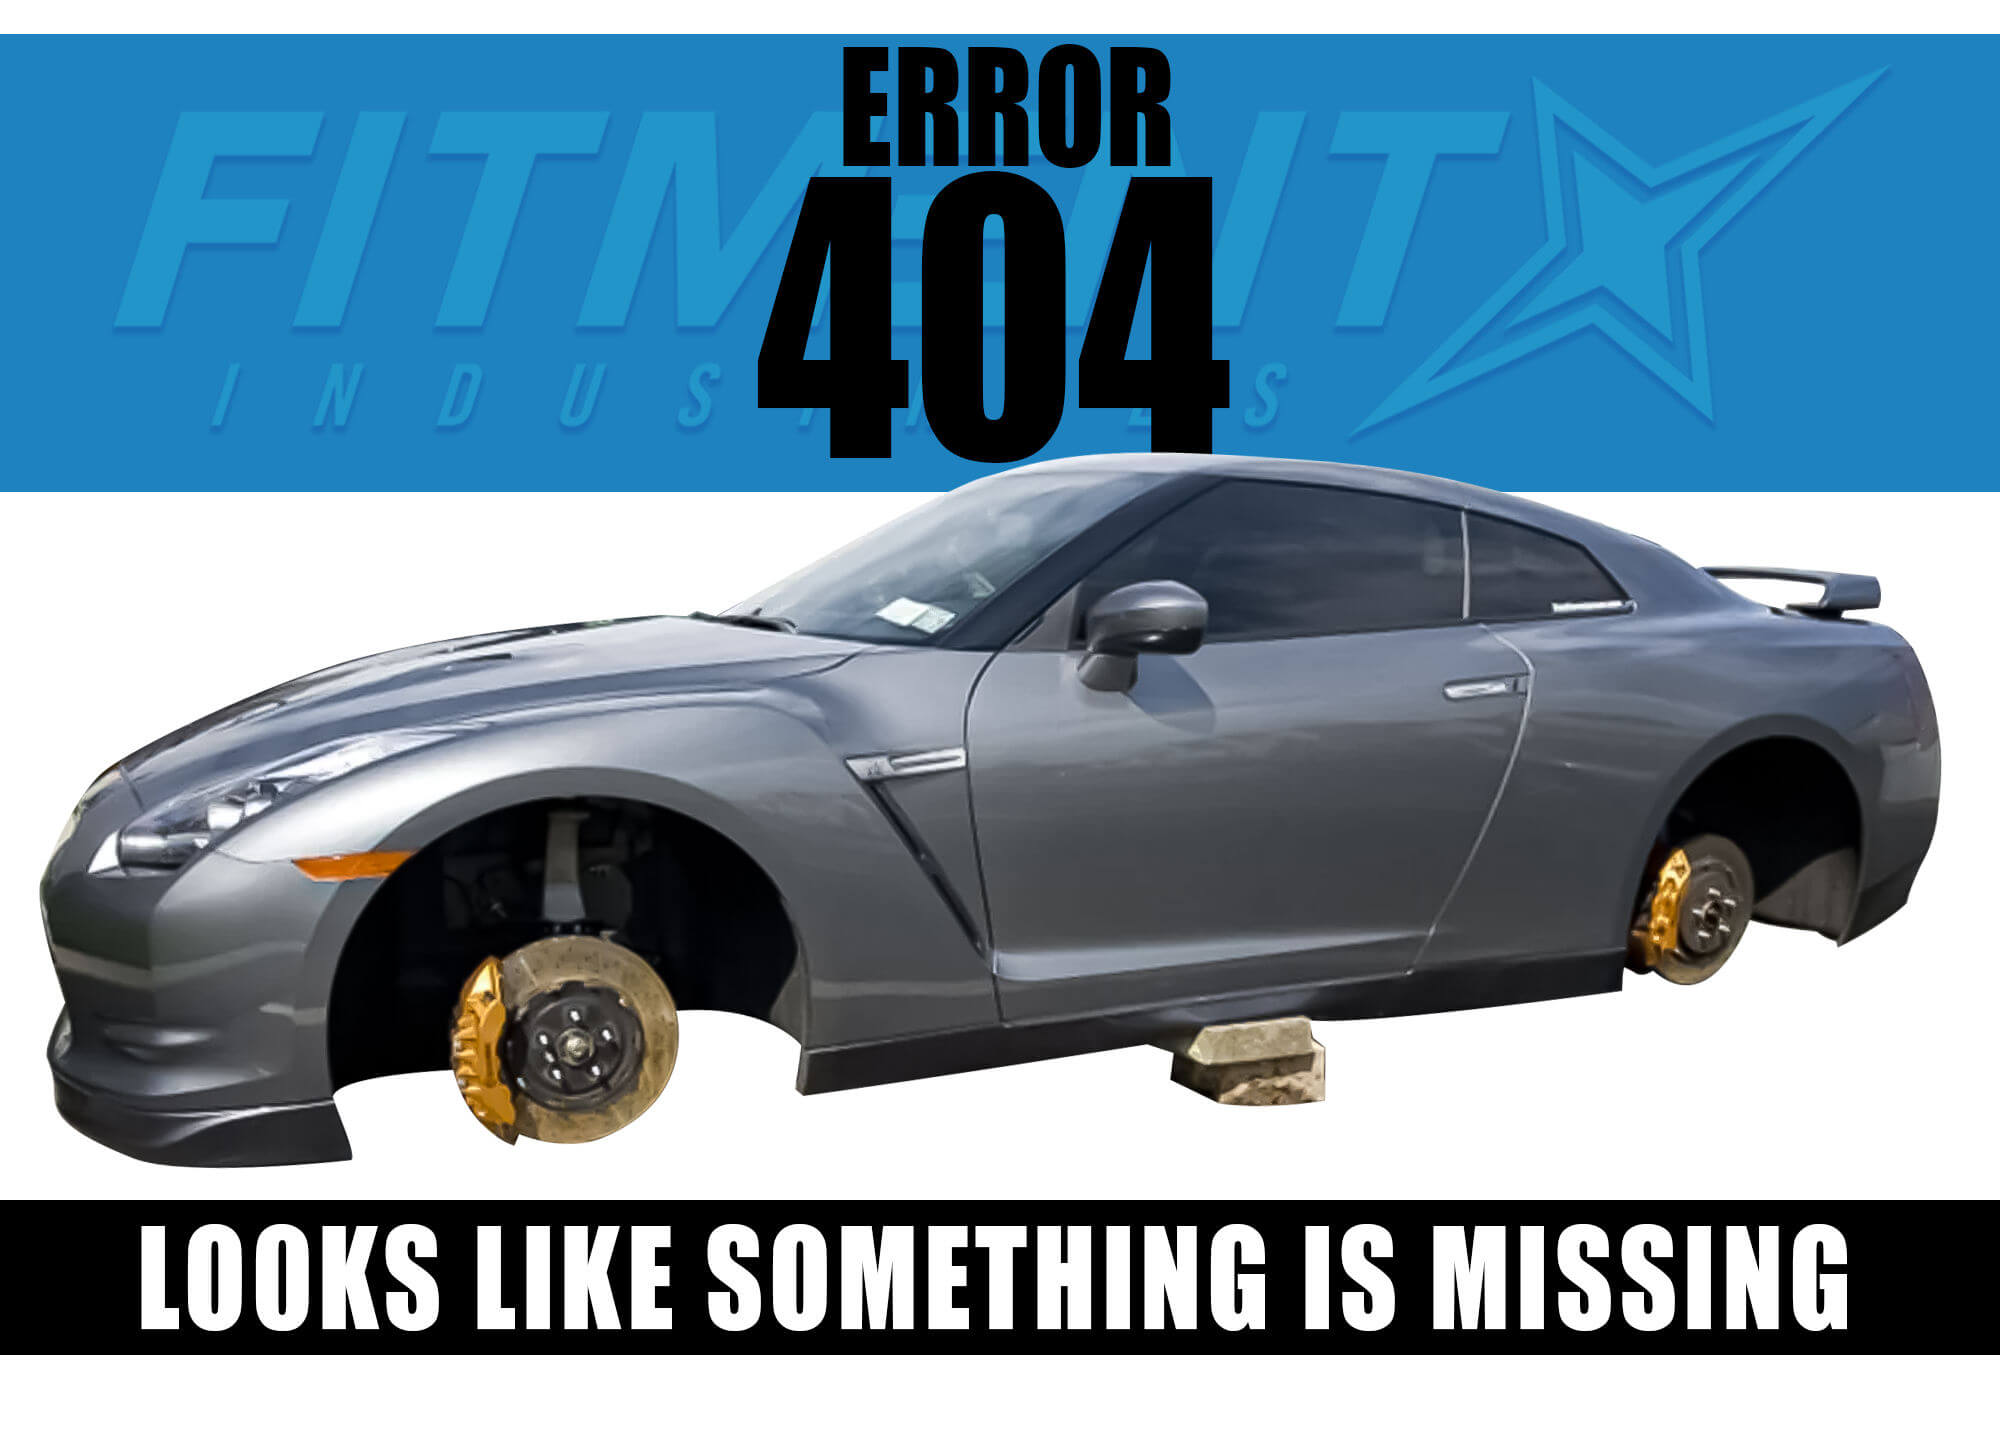 Error 404 - Looks Like Something Is Missing